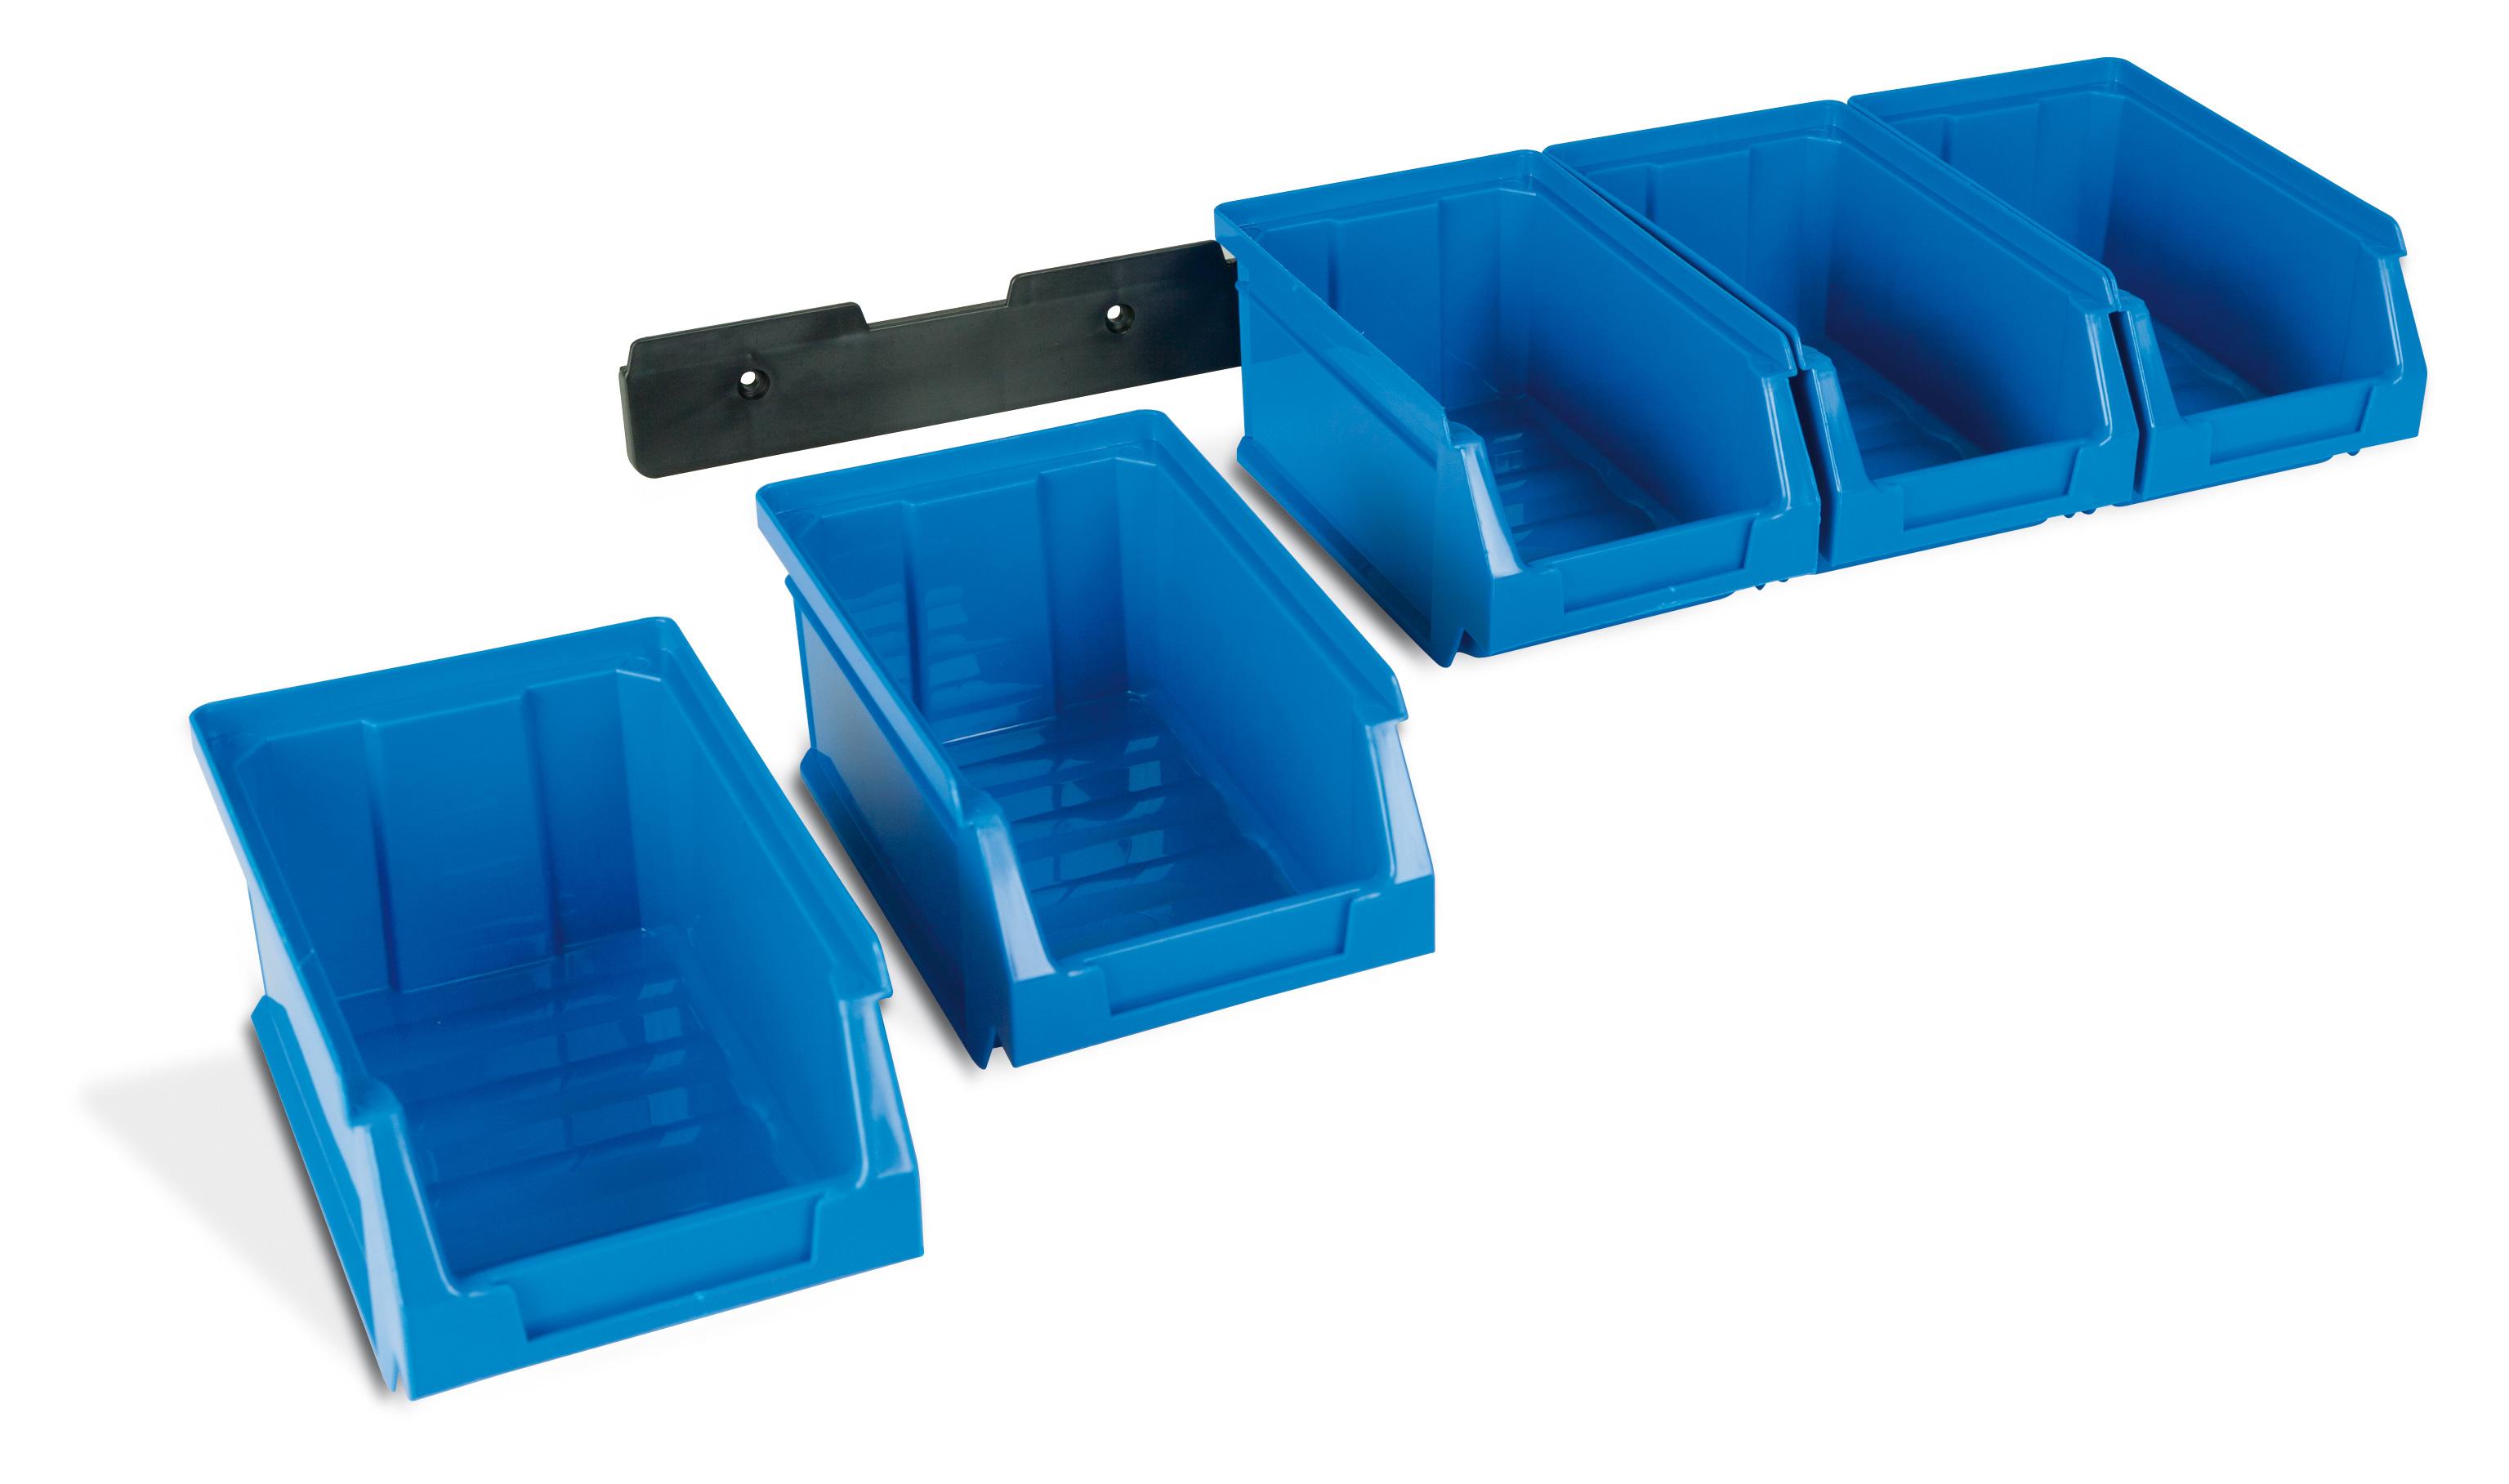 2 kit de colgar - Gavetas de plástico apilables